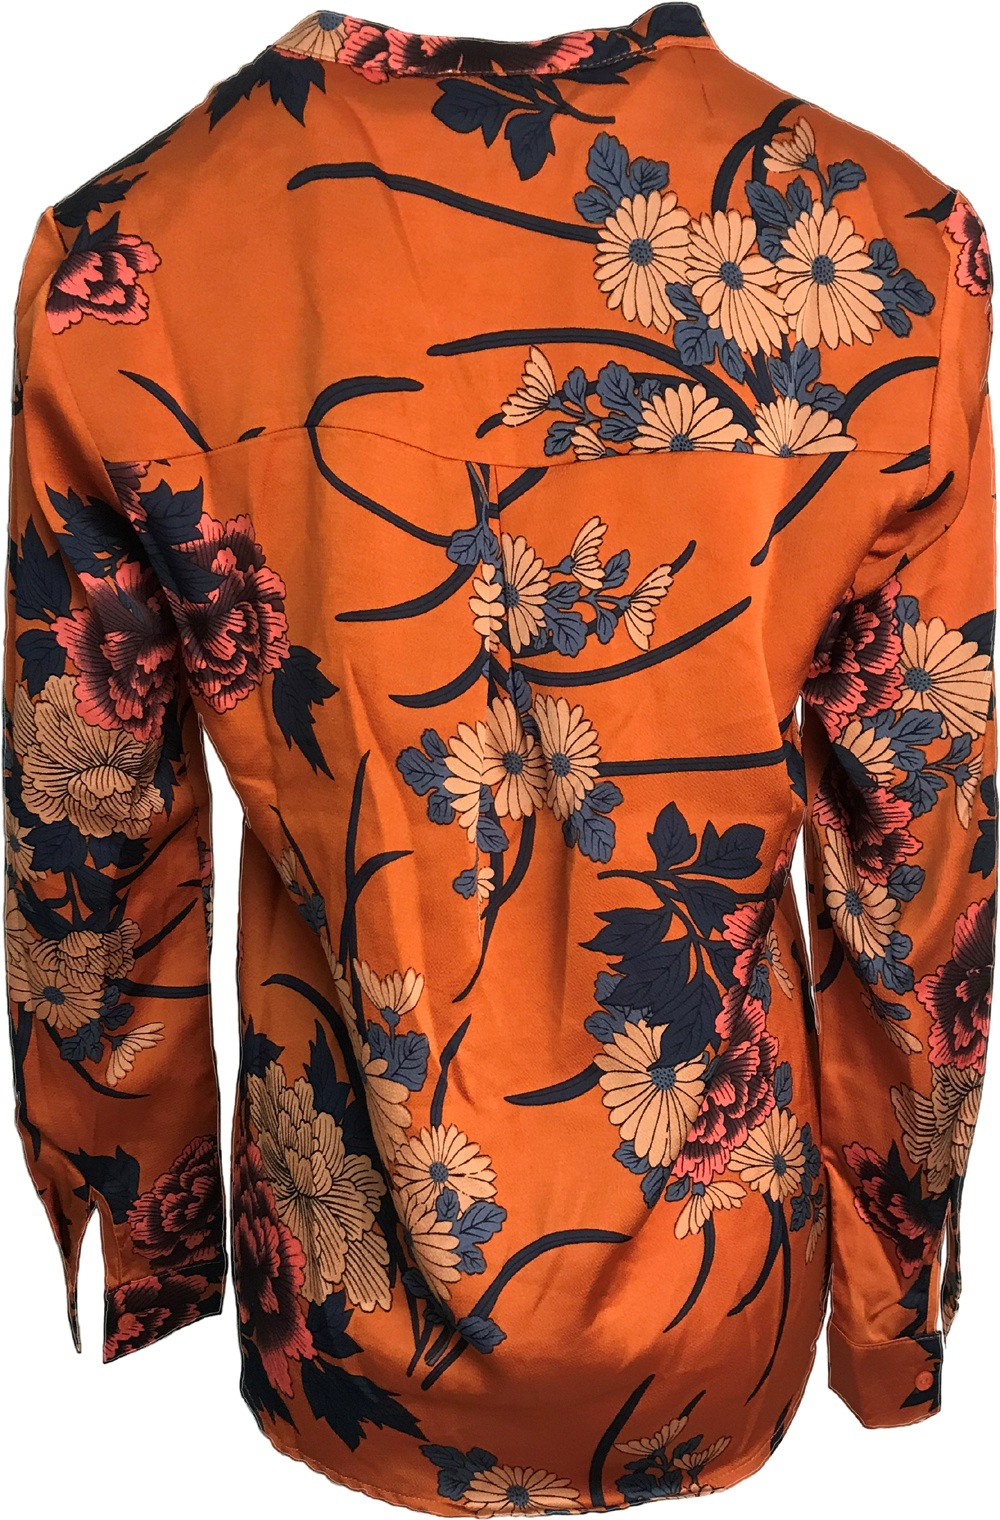 neonoir-pandora-flower-shirt-orange